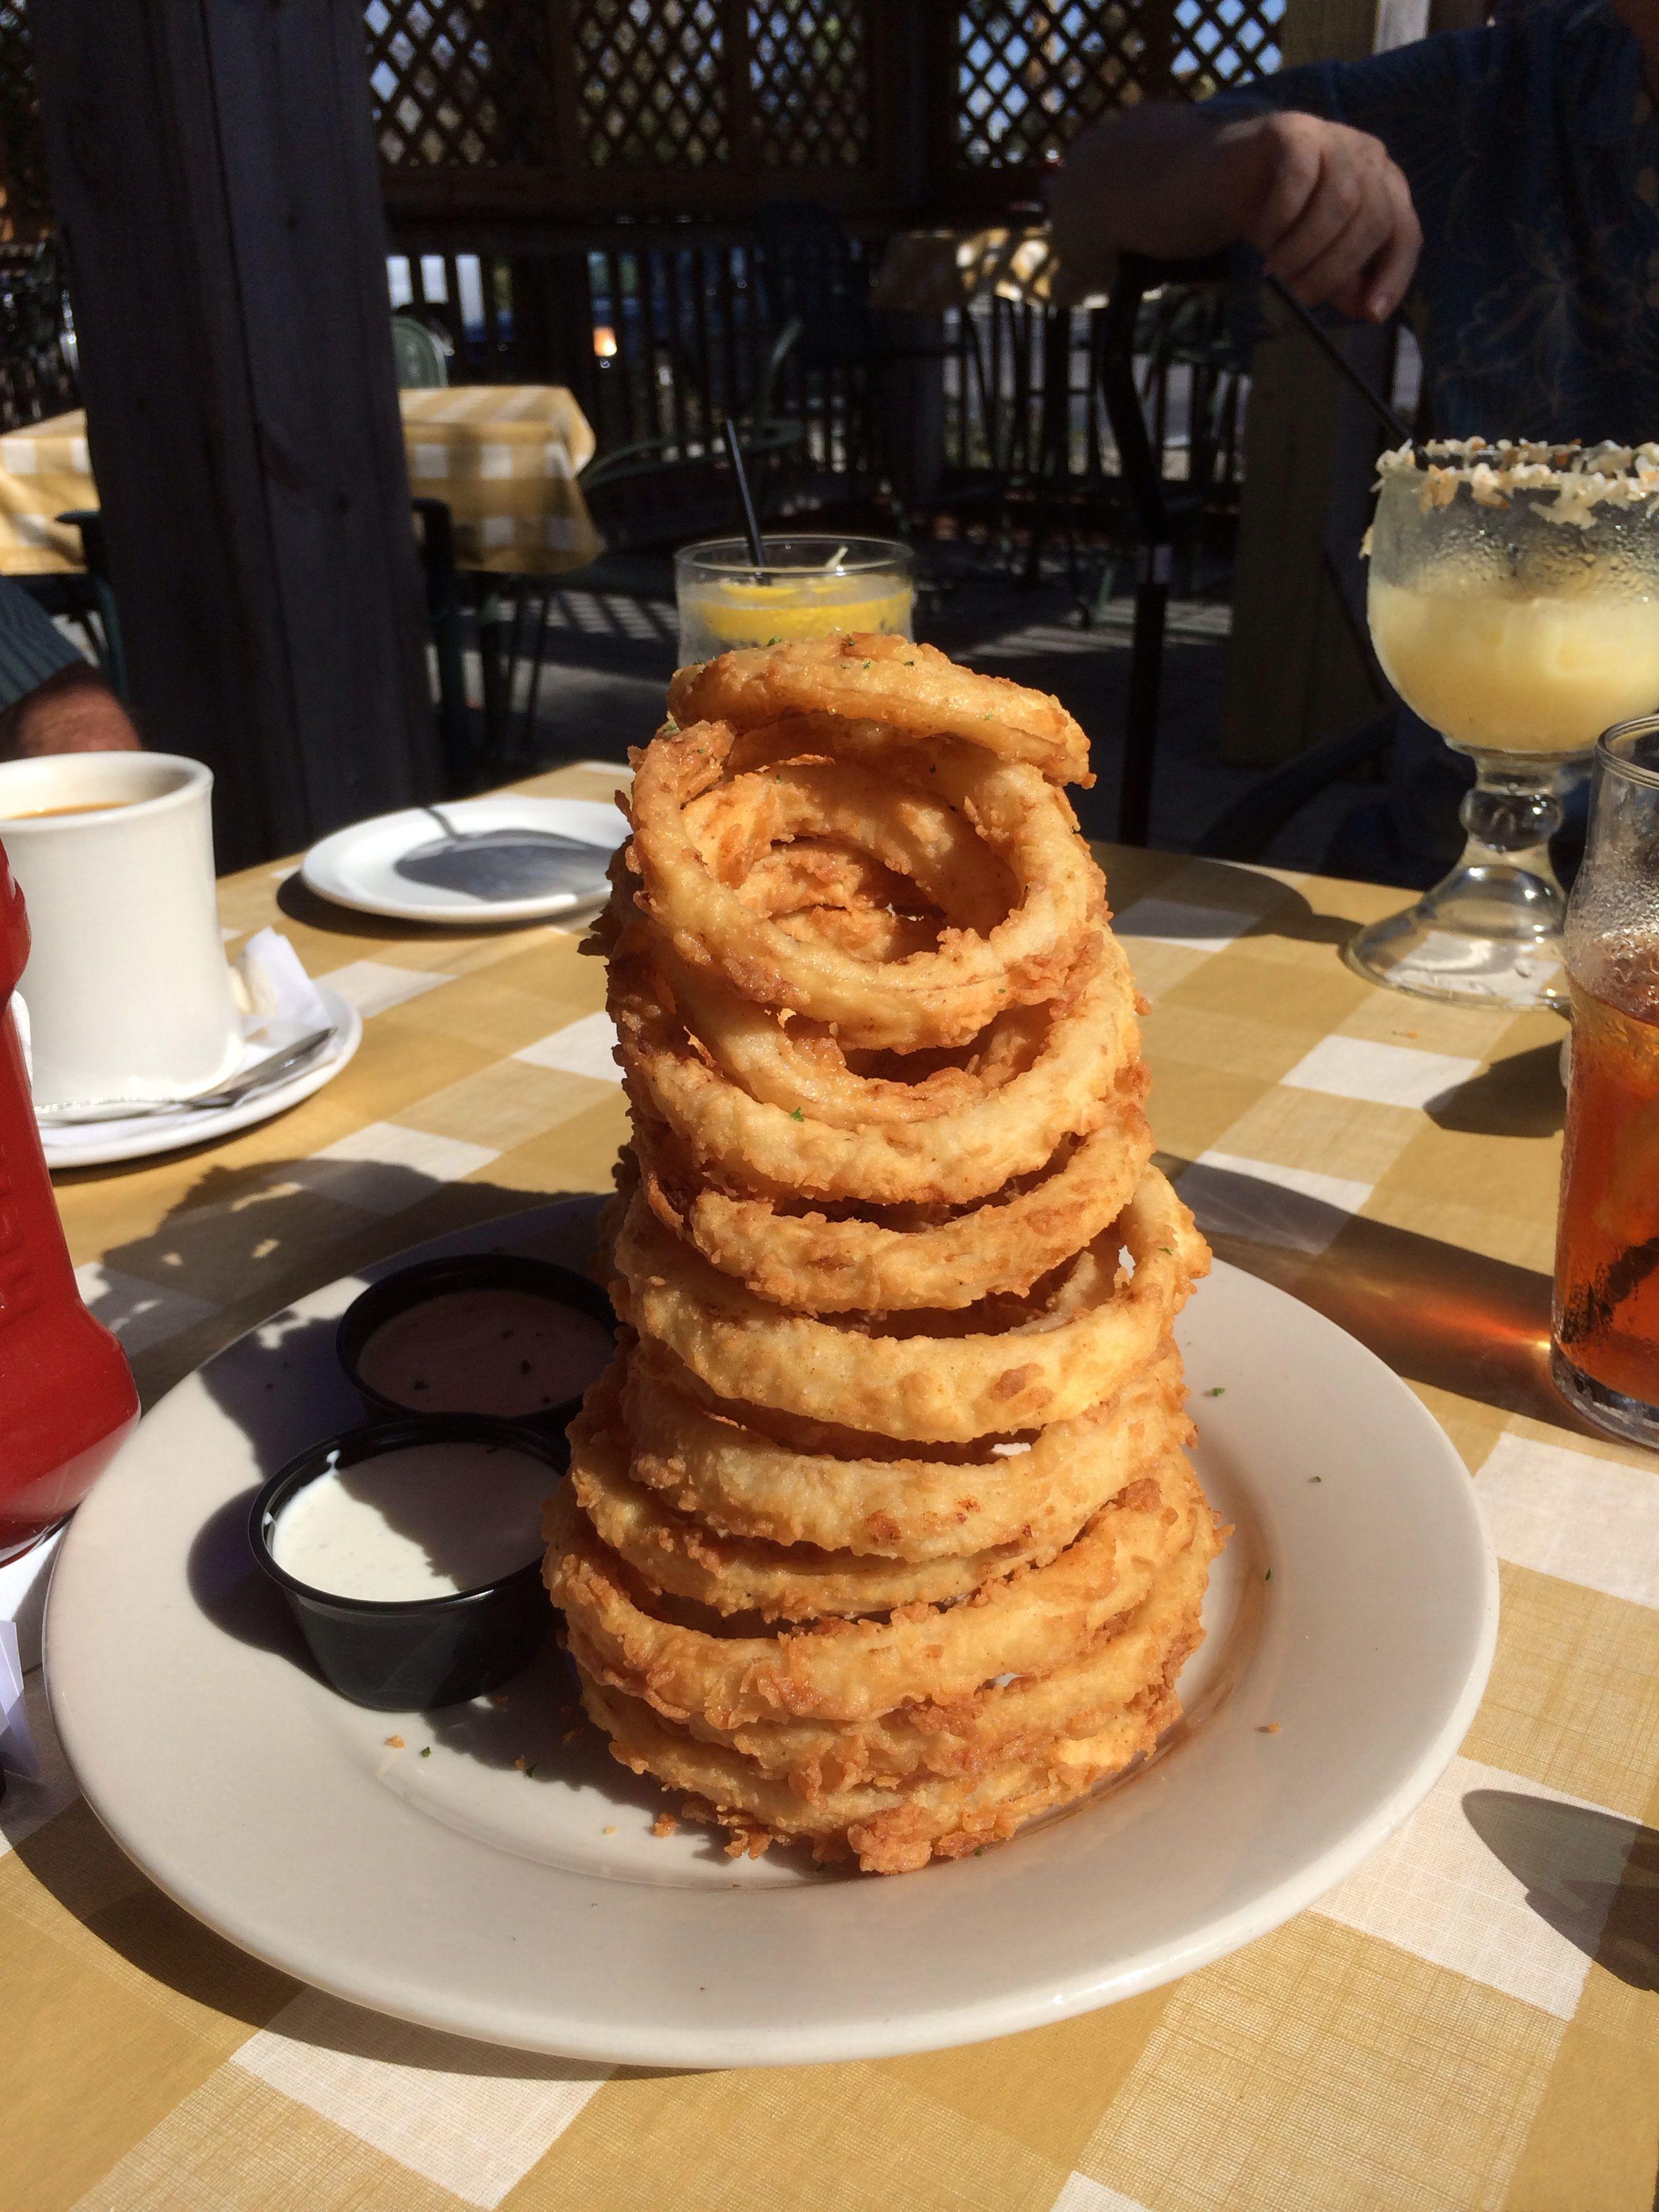 Onion rings at Cheddars